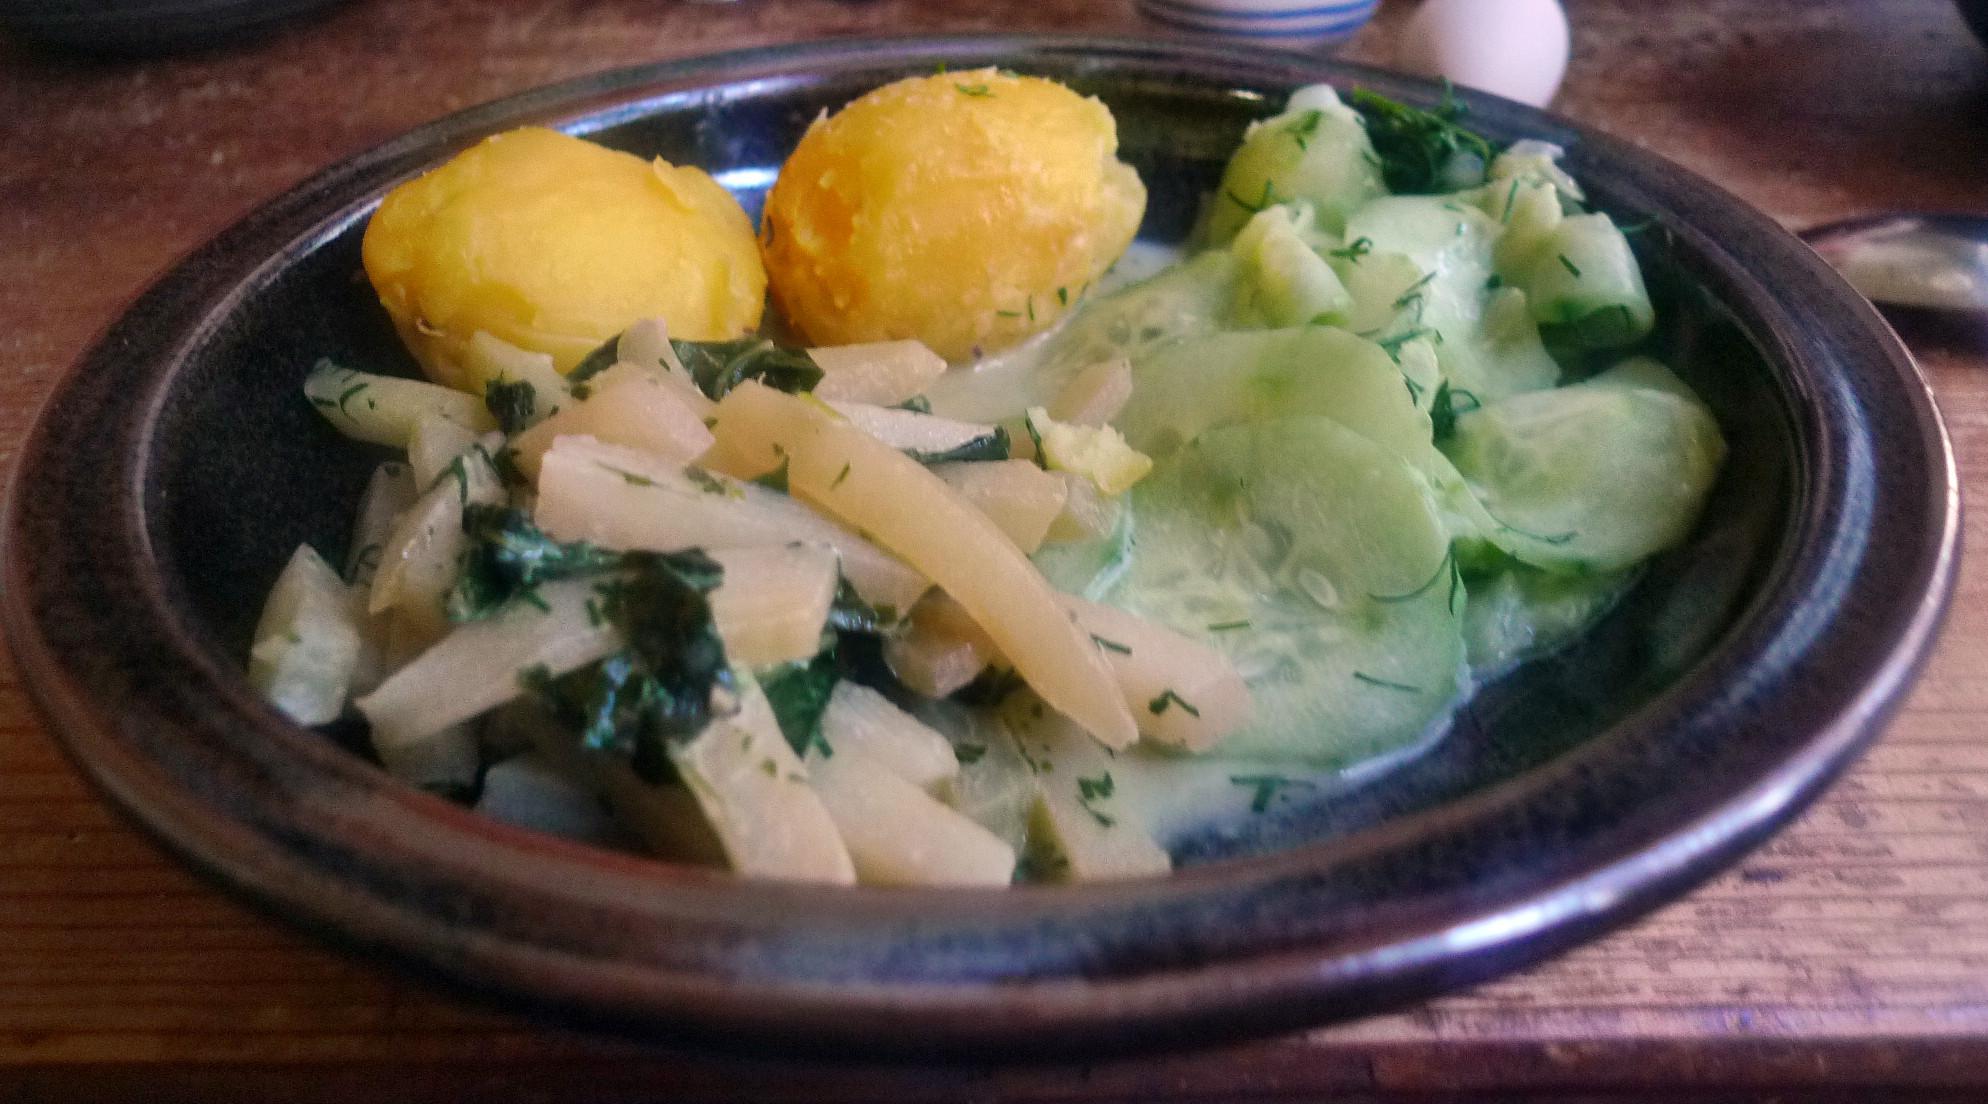 Selleriegemüse,Gurkensalat,Kartoffeln,Quarkspreise-19.3.15   (15)